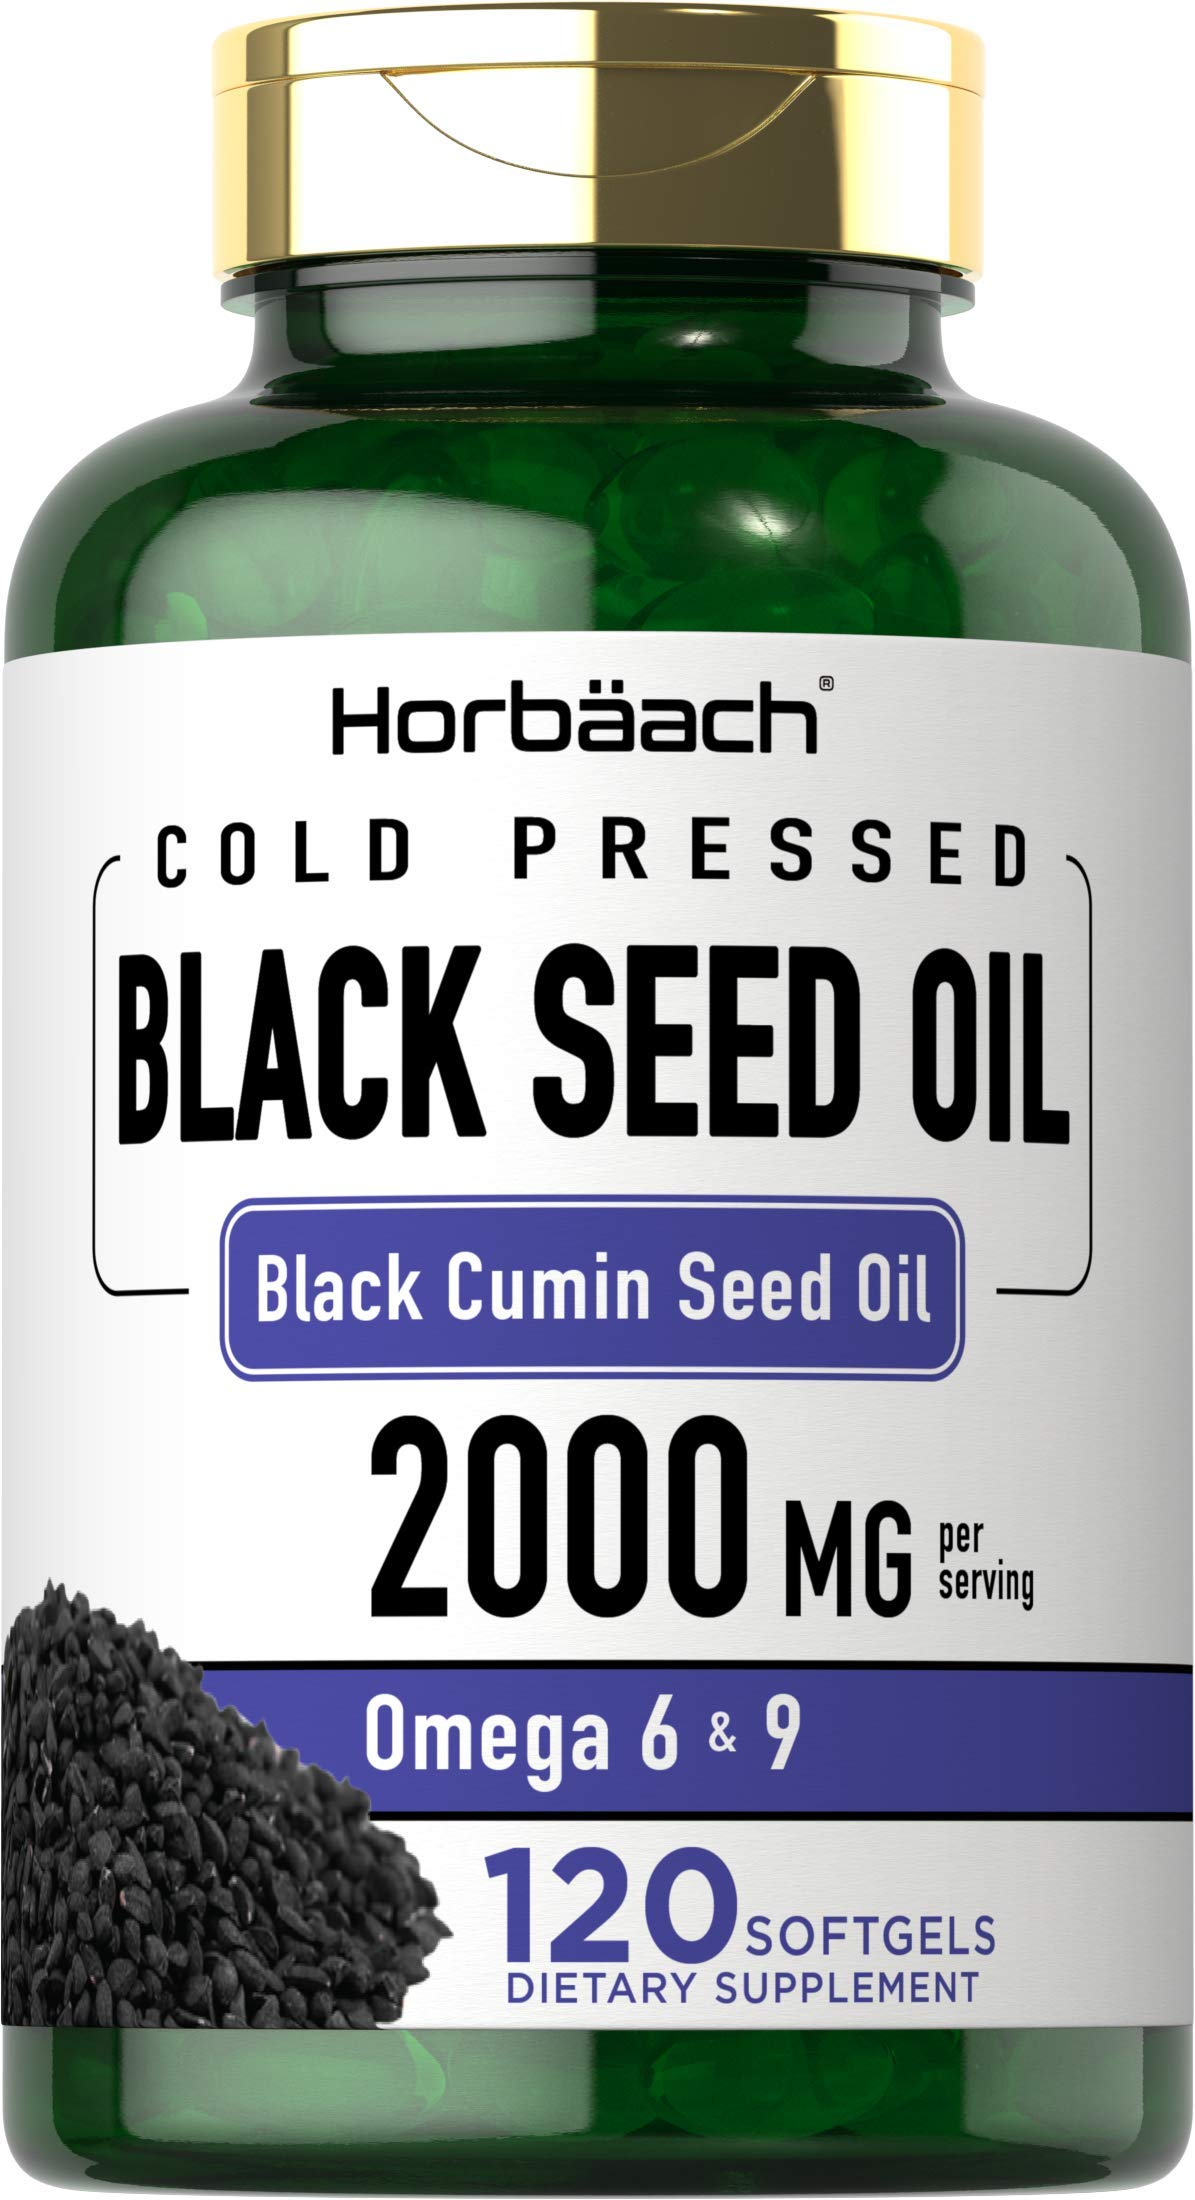 Black Seed Oil 2000mg   120 Softgel Capsules   Cold Pressed Nigella Sativa Pills   Non-GMO, Gluten Free   by Horbaach